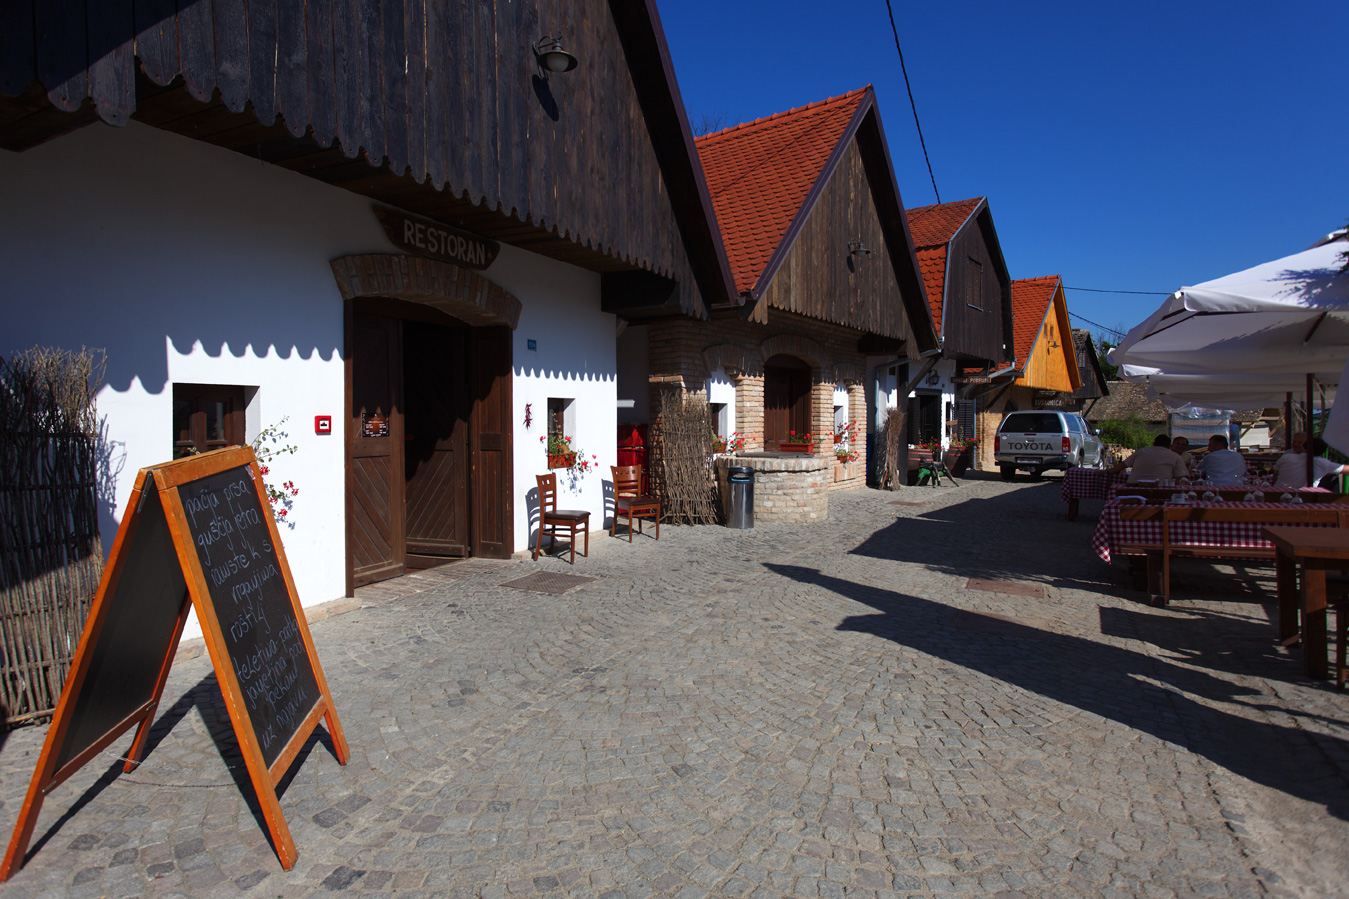 baranja, zmajevac, suza, restaurant, vineyard, vinehouse